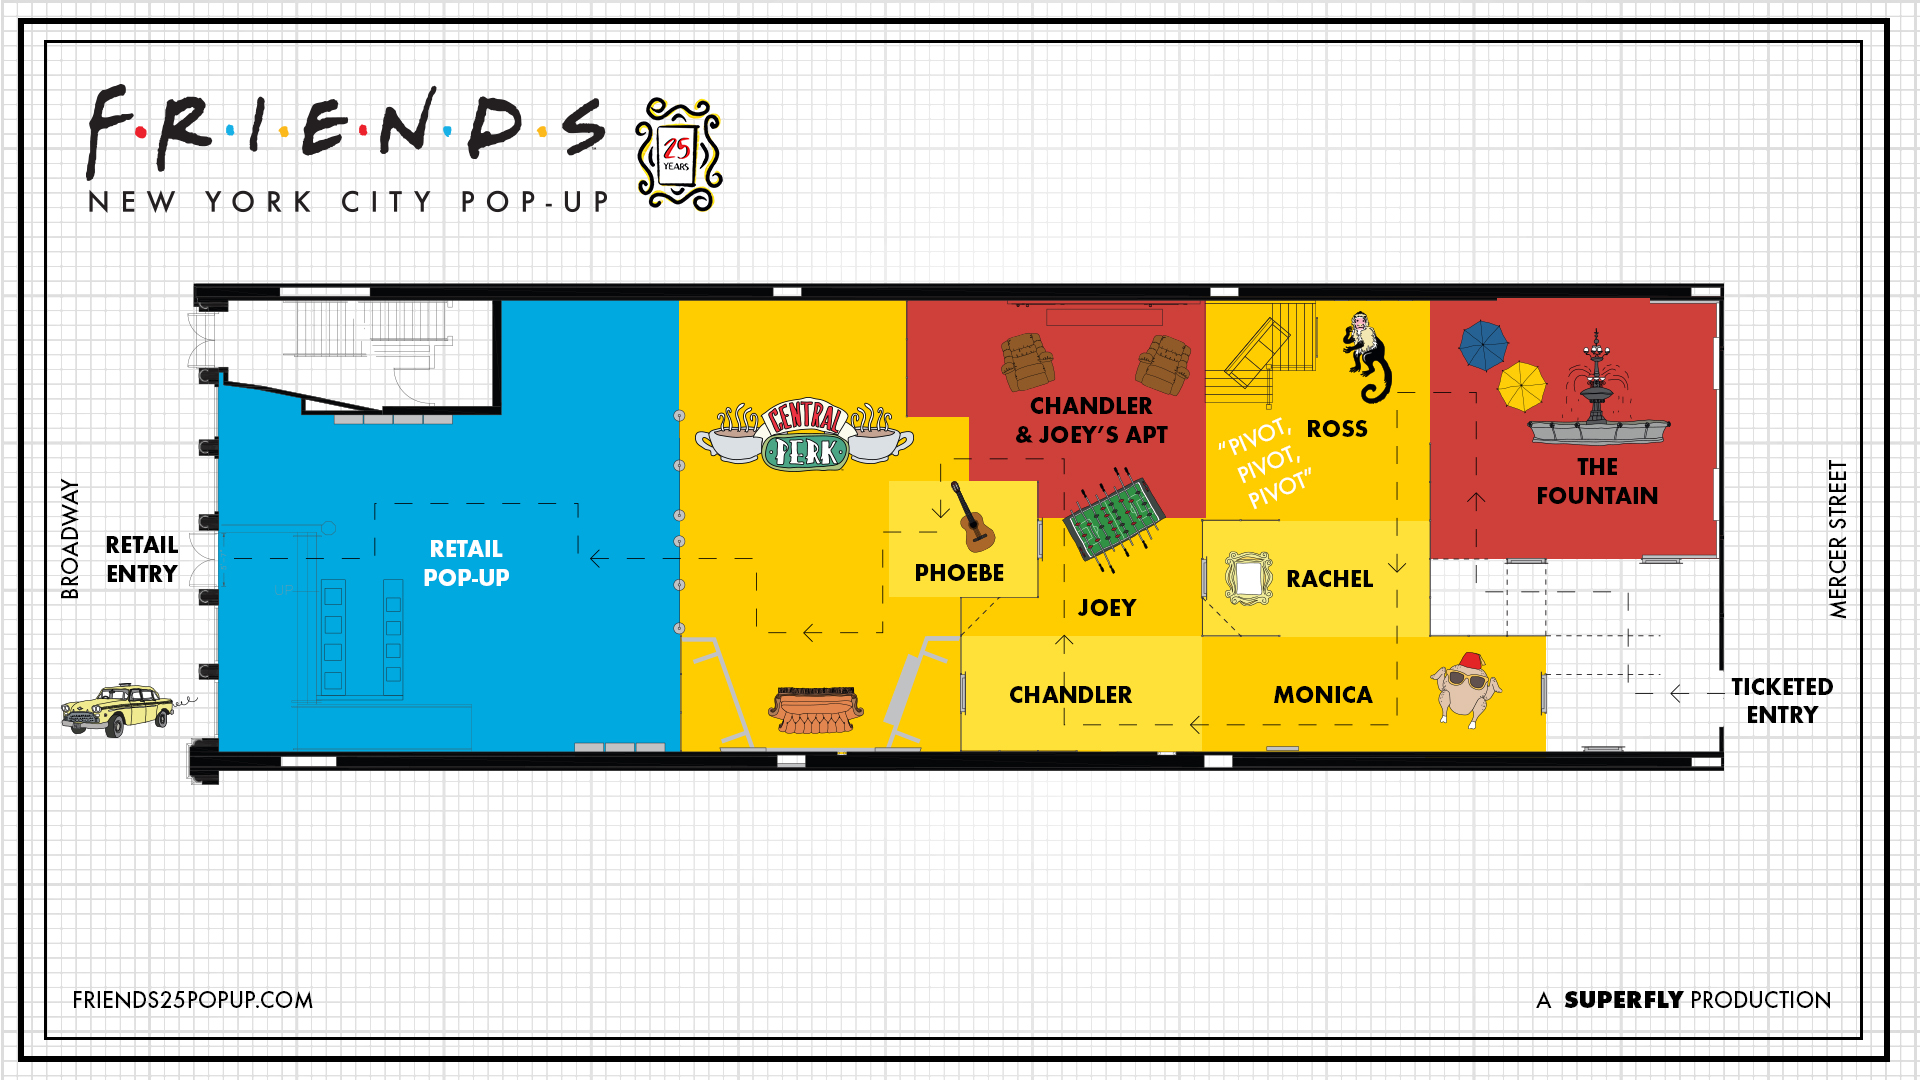 'Friends' pop-up experience layout. [Warner Bros.]